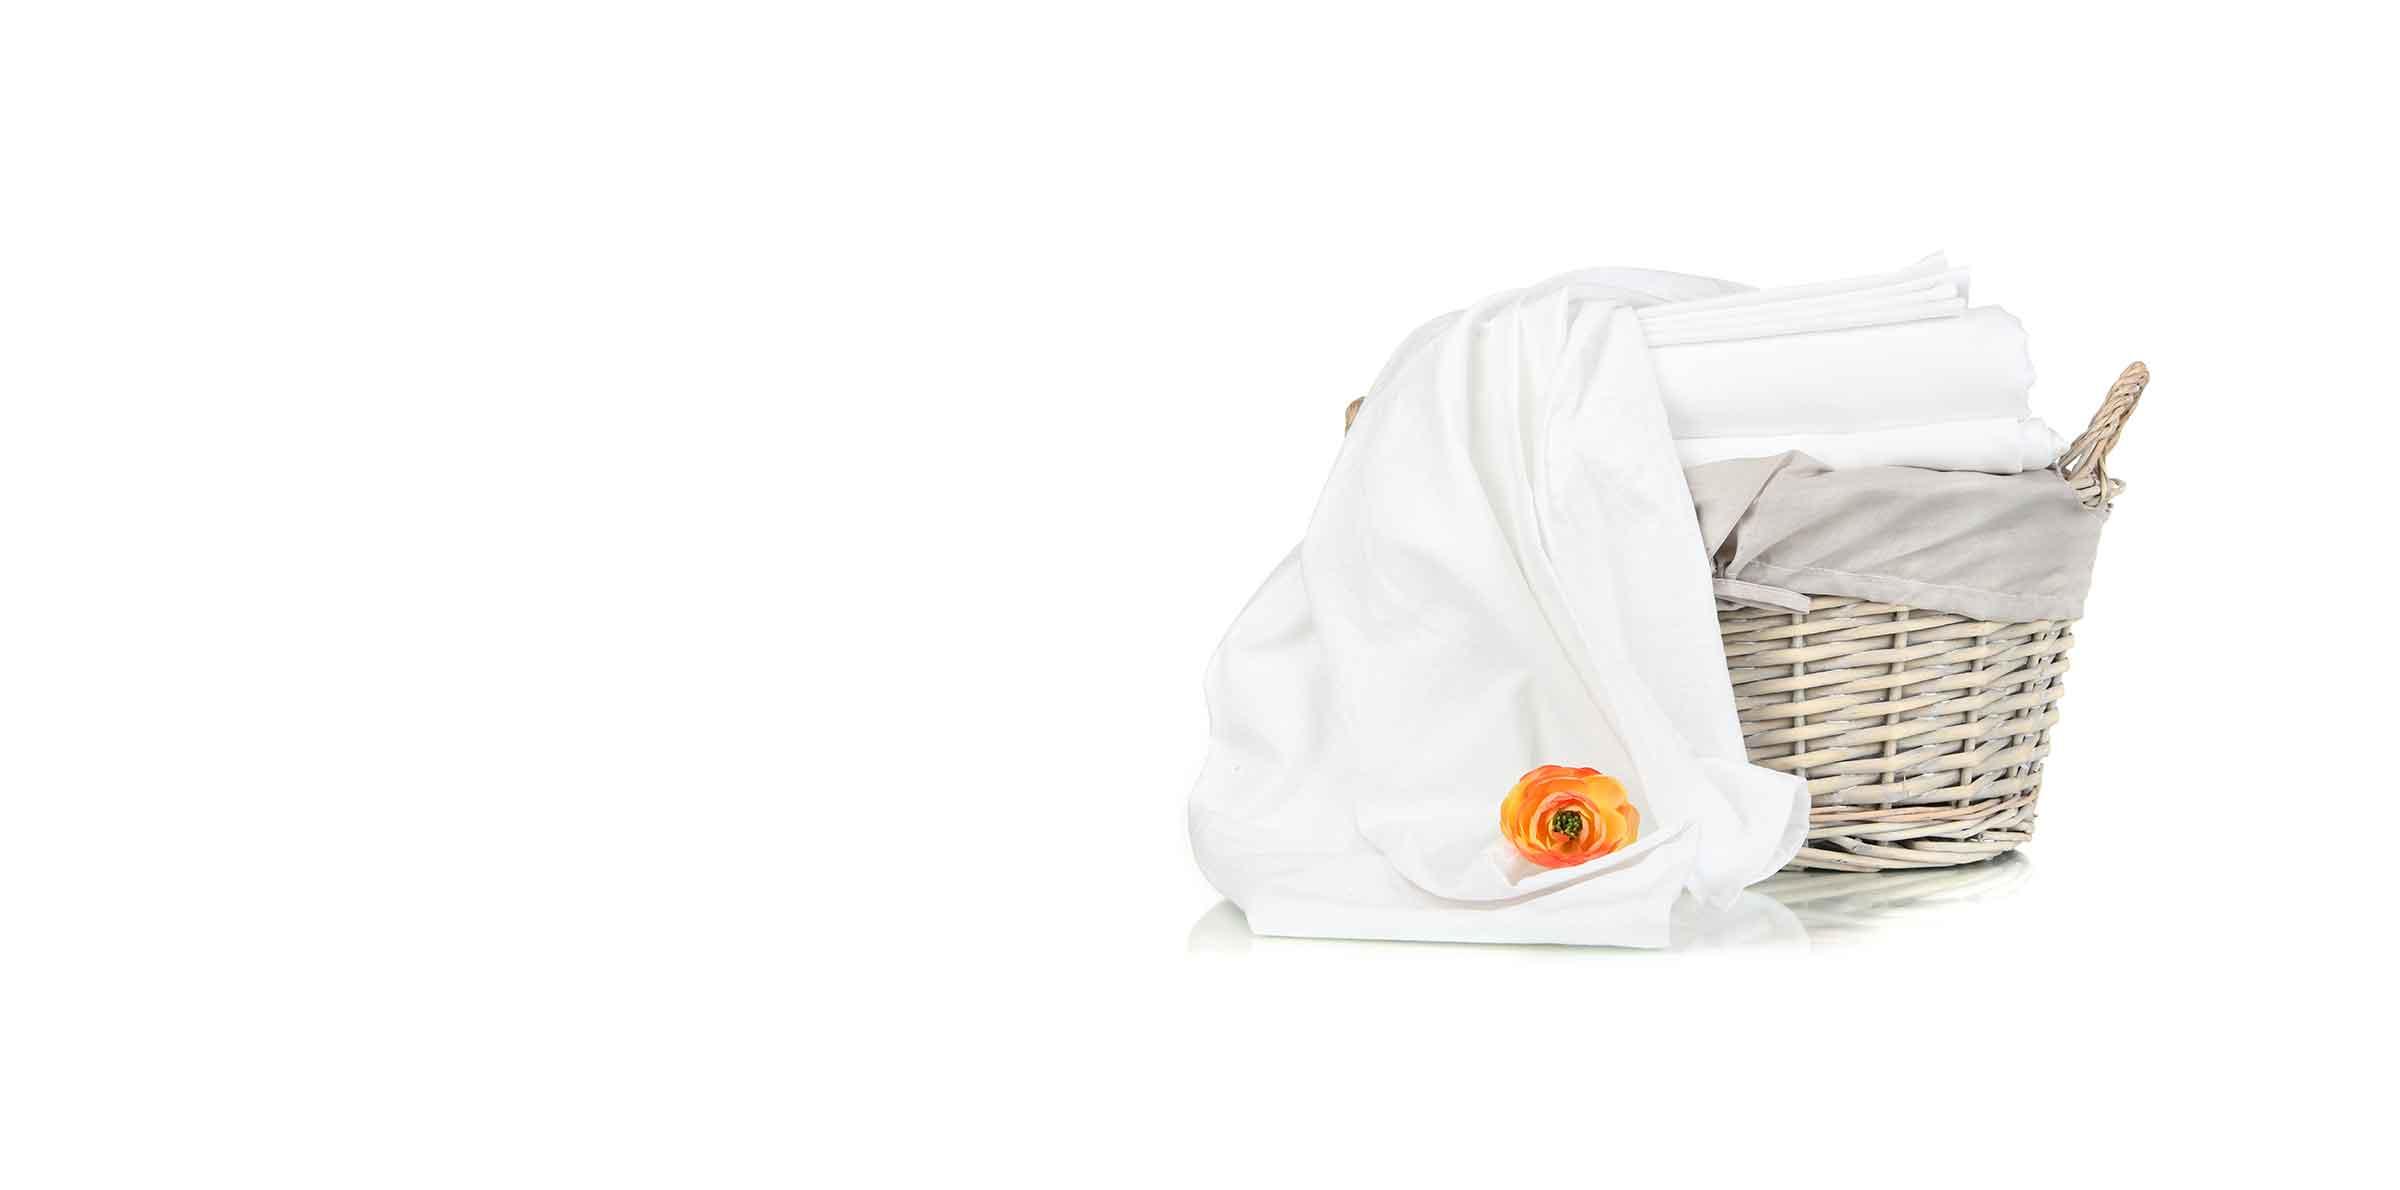 Allergie-Encasing-Bettbezug-Pflegetipps